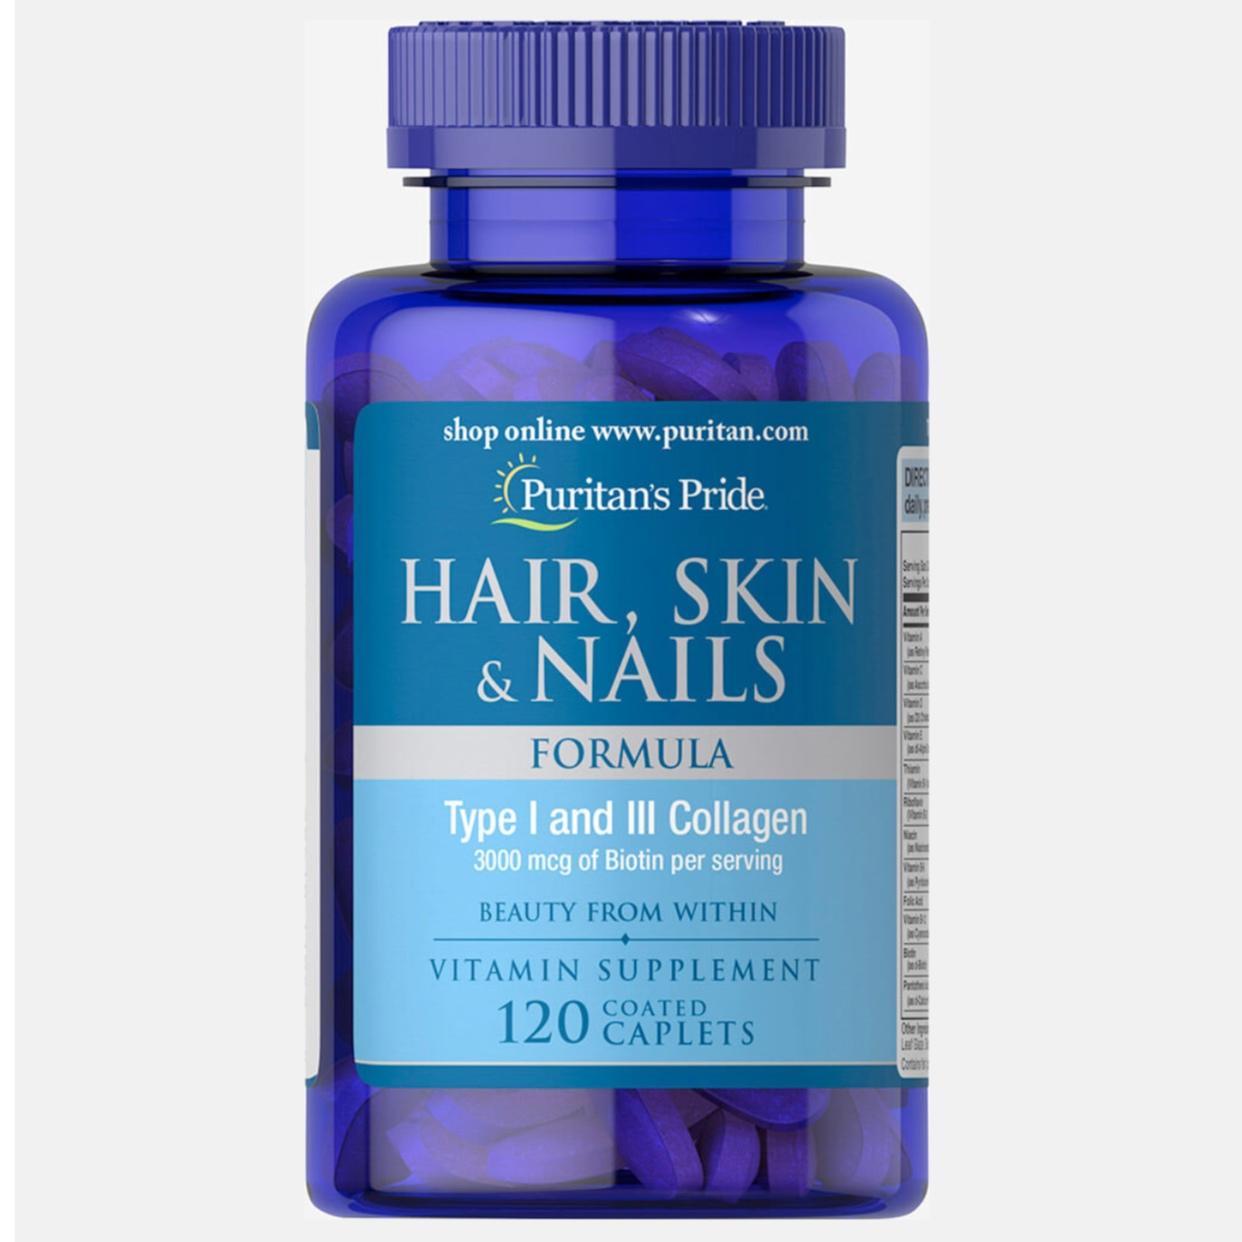 Puritan's Pride, Hair Skin & Nails Formula, 120 Caplets